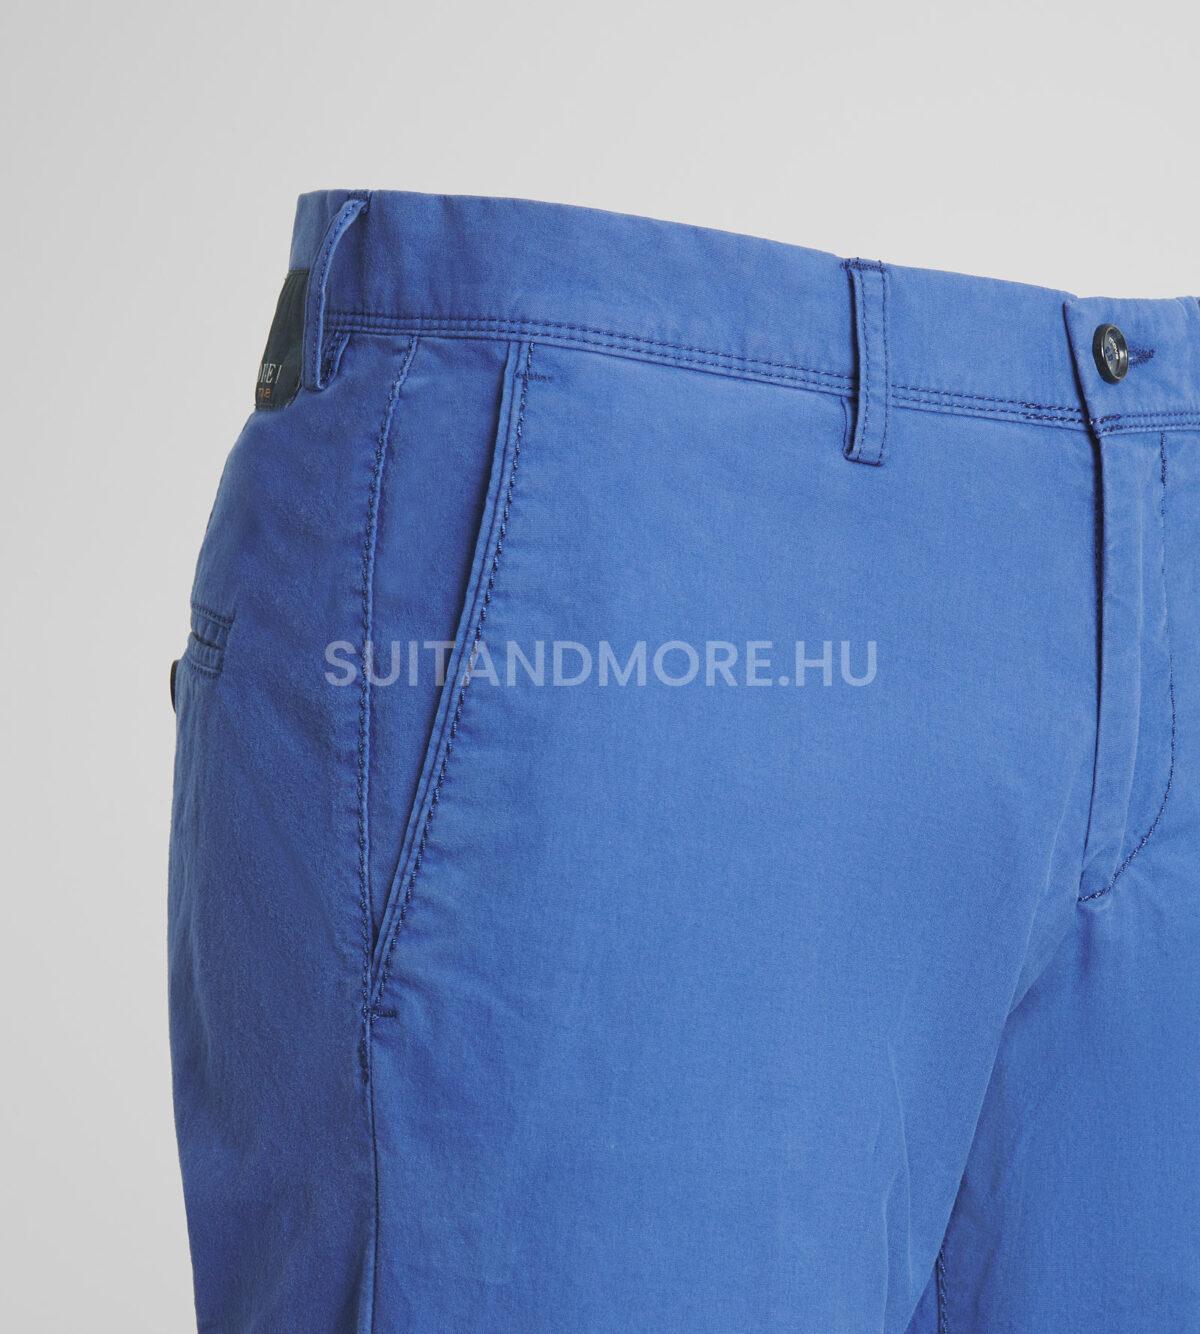 középkék-extra-slim-fit-pamut-sztreccs-chino-nadrág-NIGEL-1181539-24-02